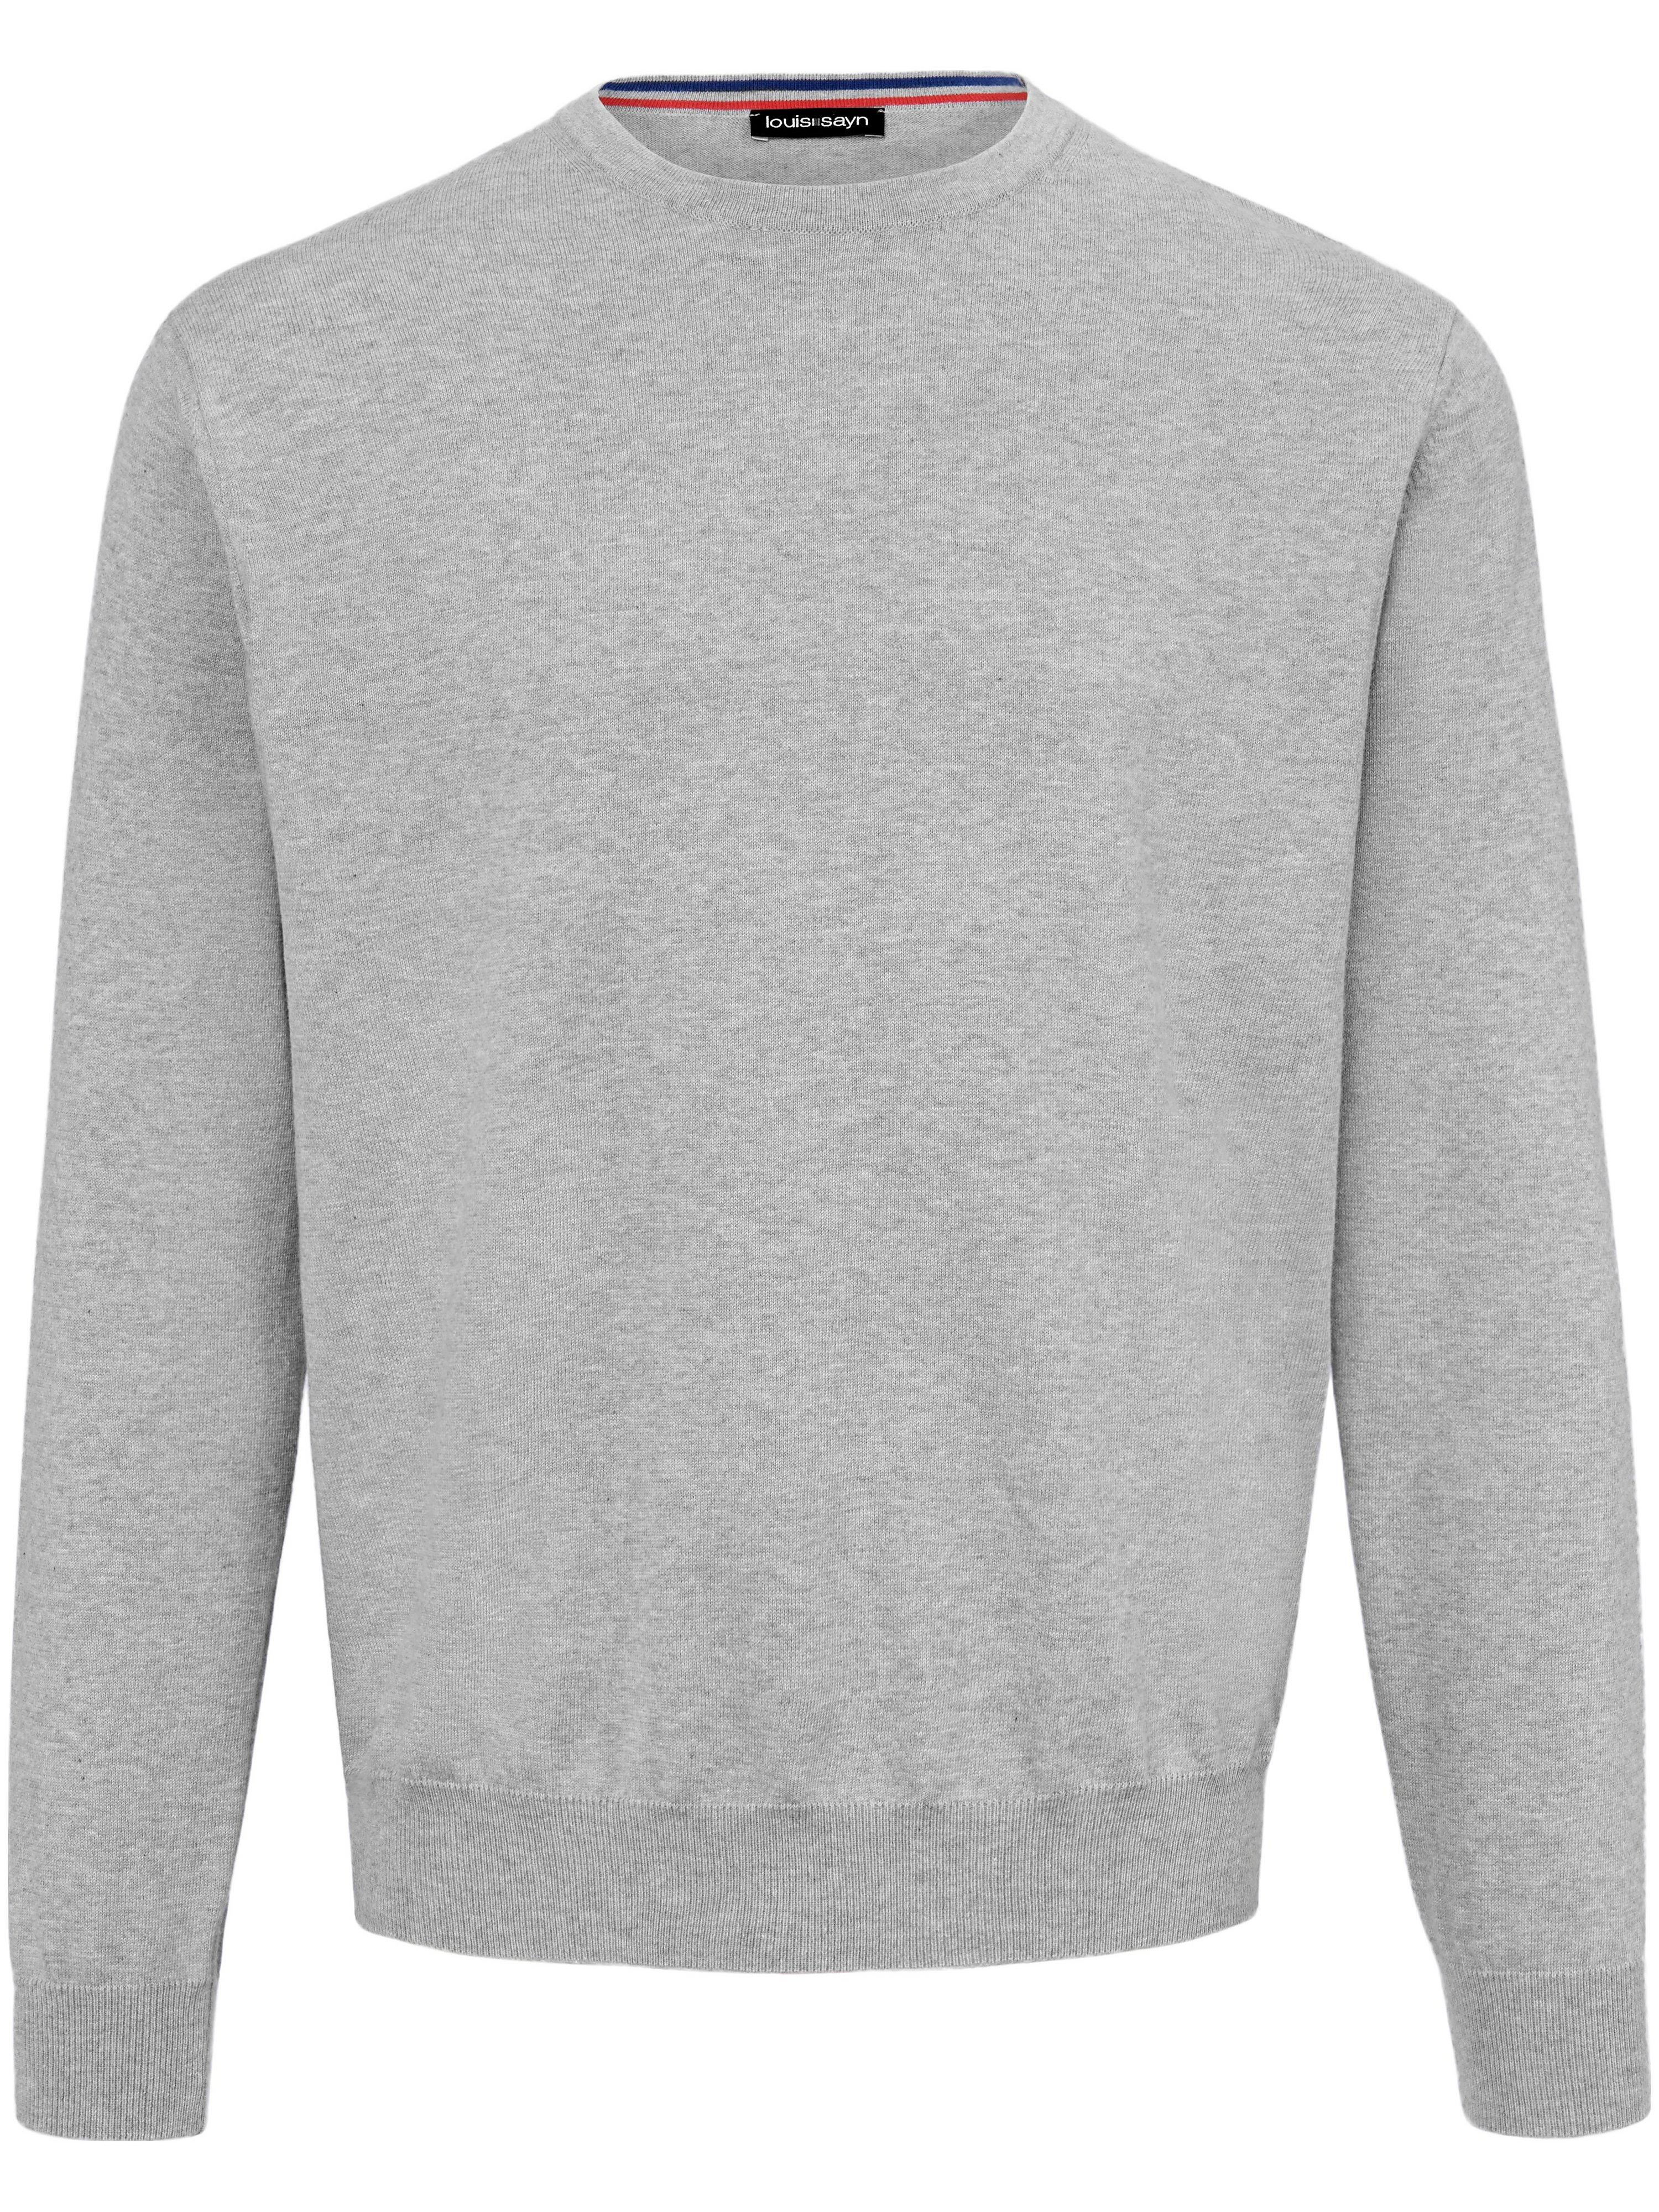 louis sayn - Pullover aus 100% Baumwolle Pima Cotton  grau